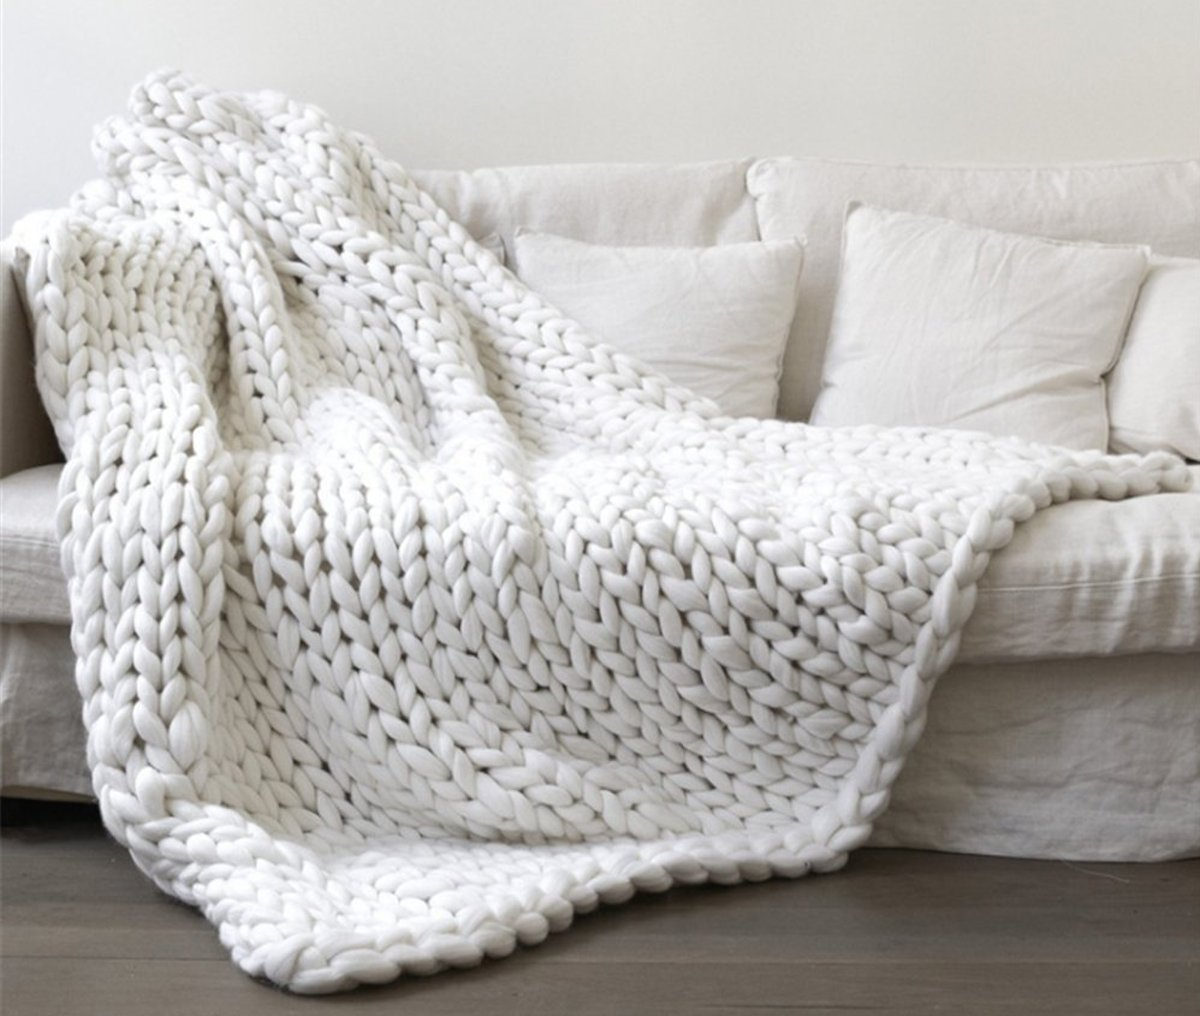 white chunky knite throw blanket on white couch